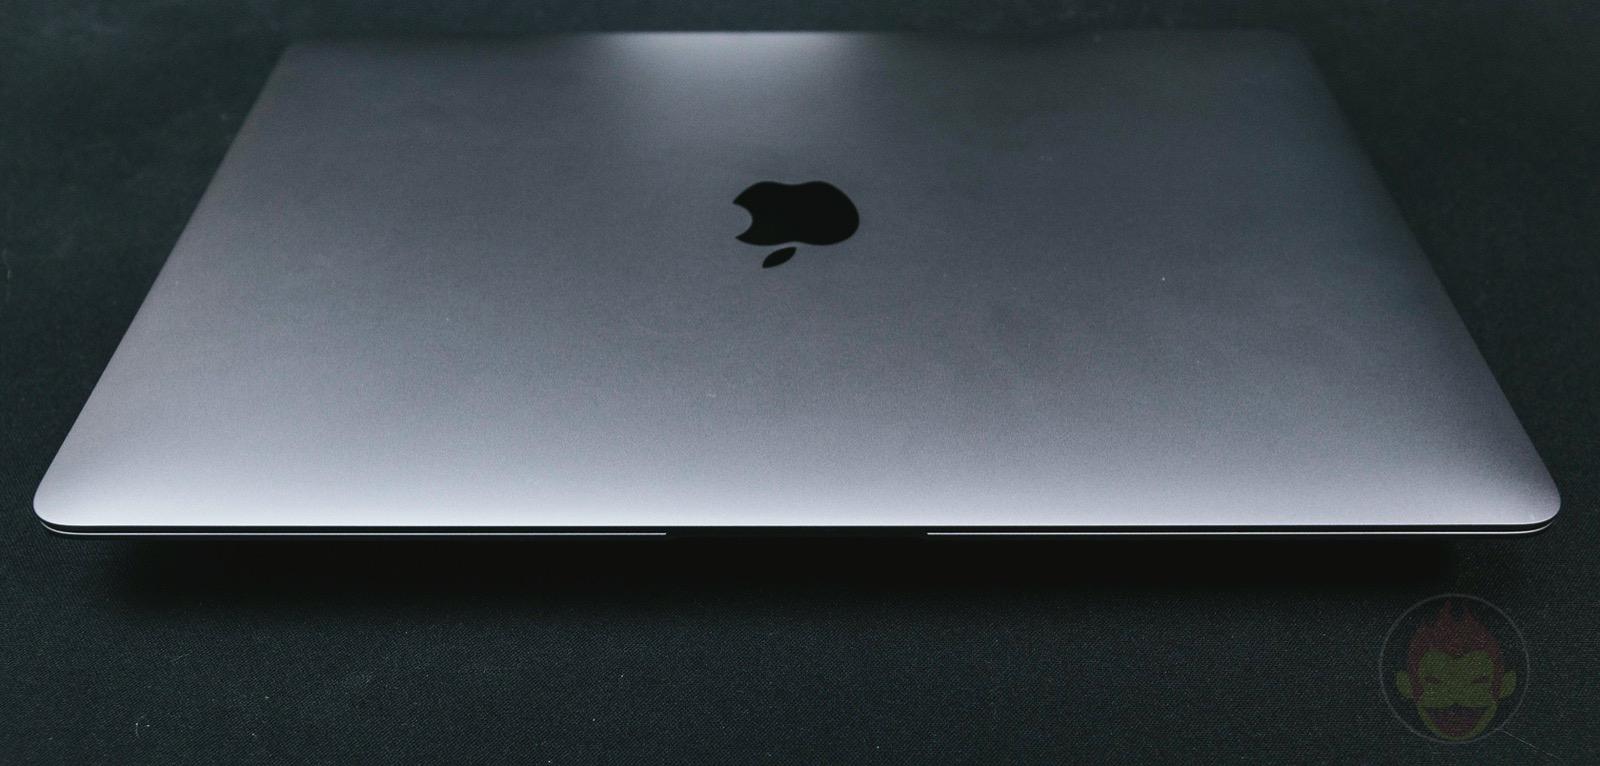 Using-MacBook-Air-day-one-01.jpg